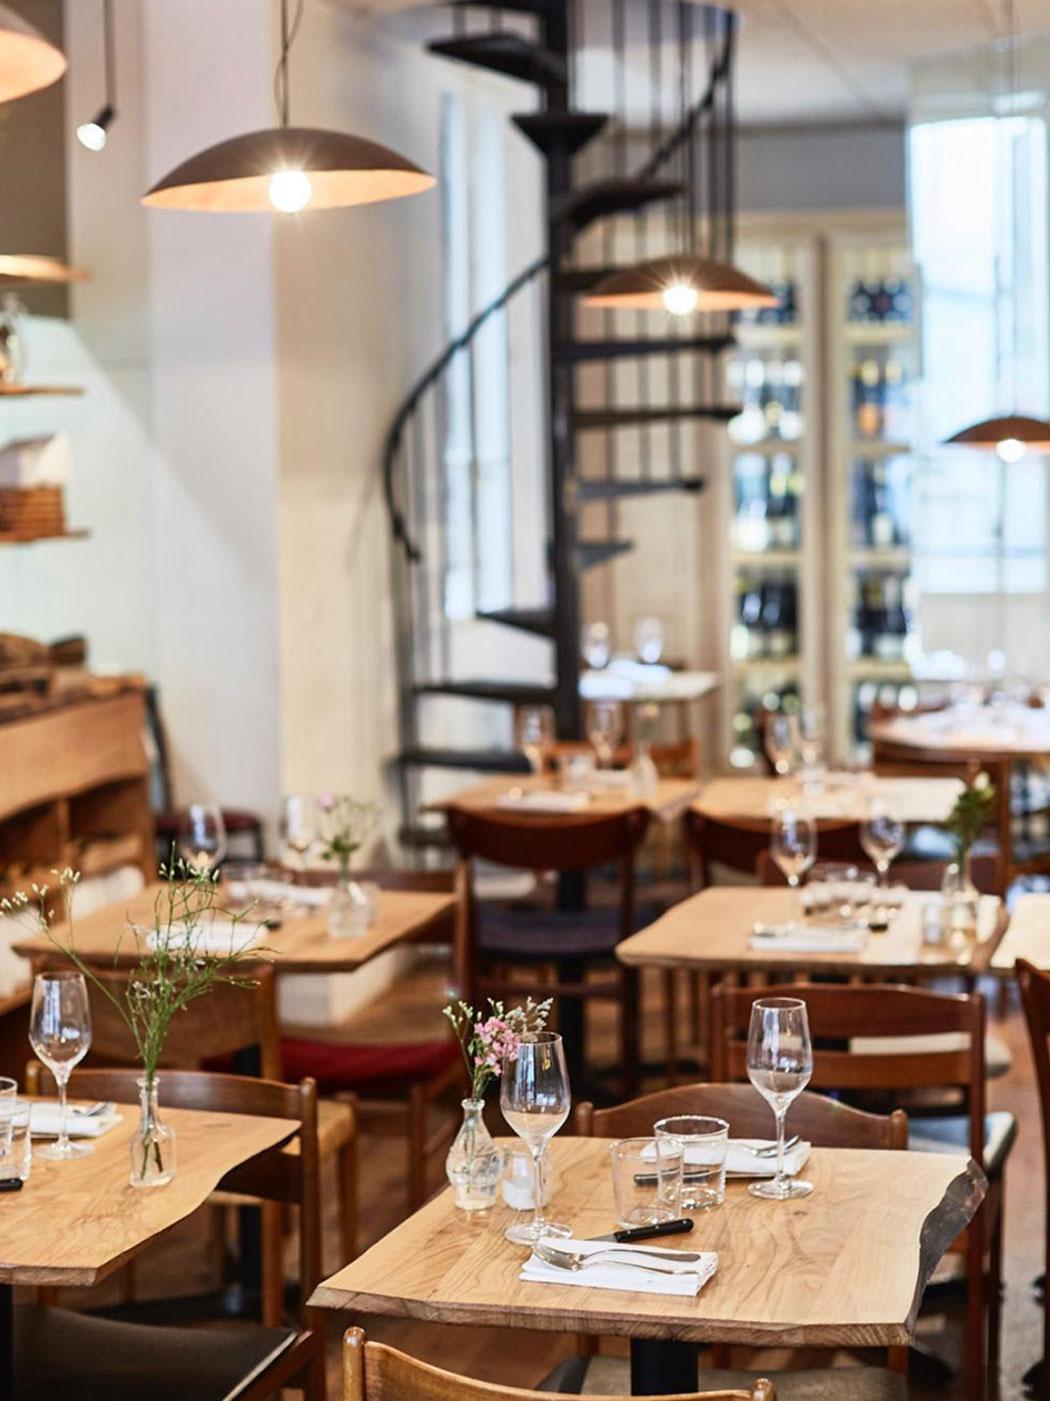 The_Ink_Collective_Inside_Ink_Pret_a_Partir_Paris_Guide_Restaurants_Fulgurances_6.jpg